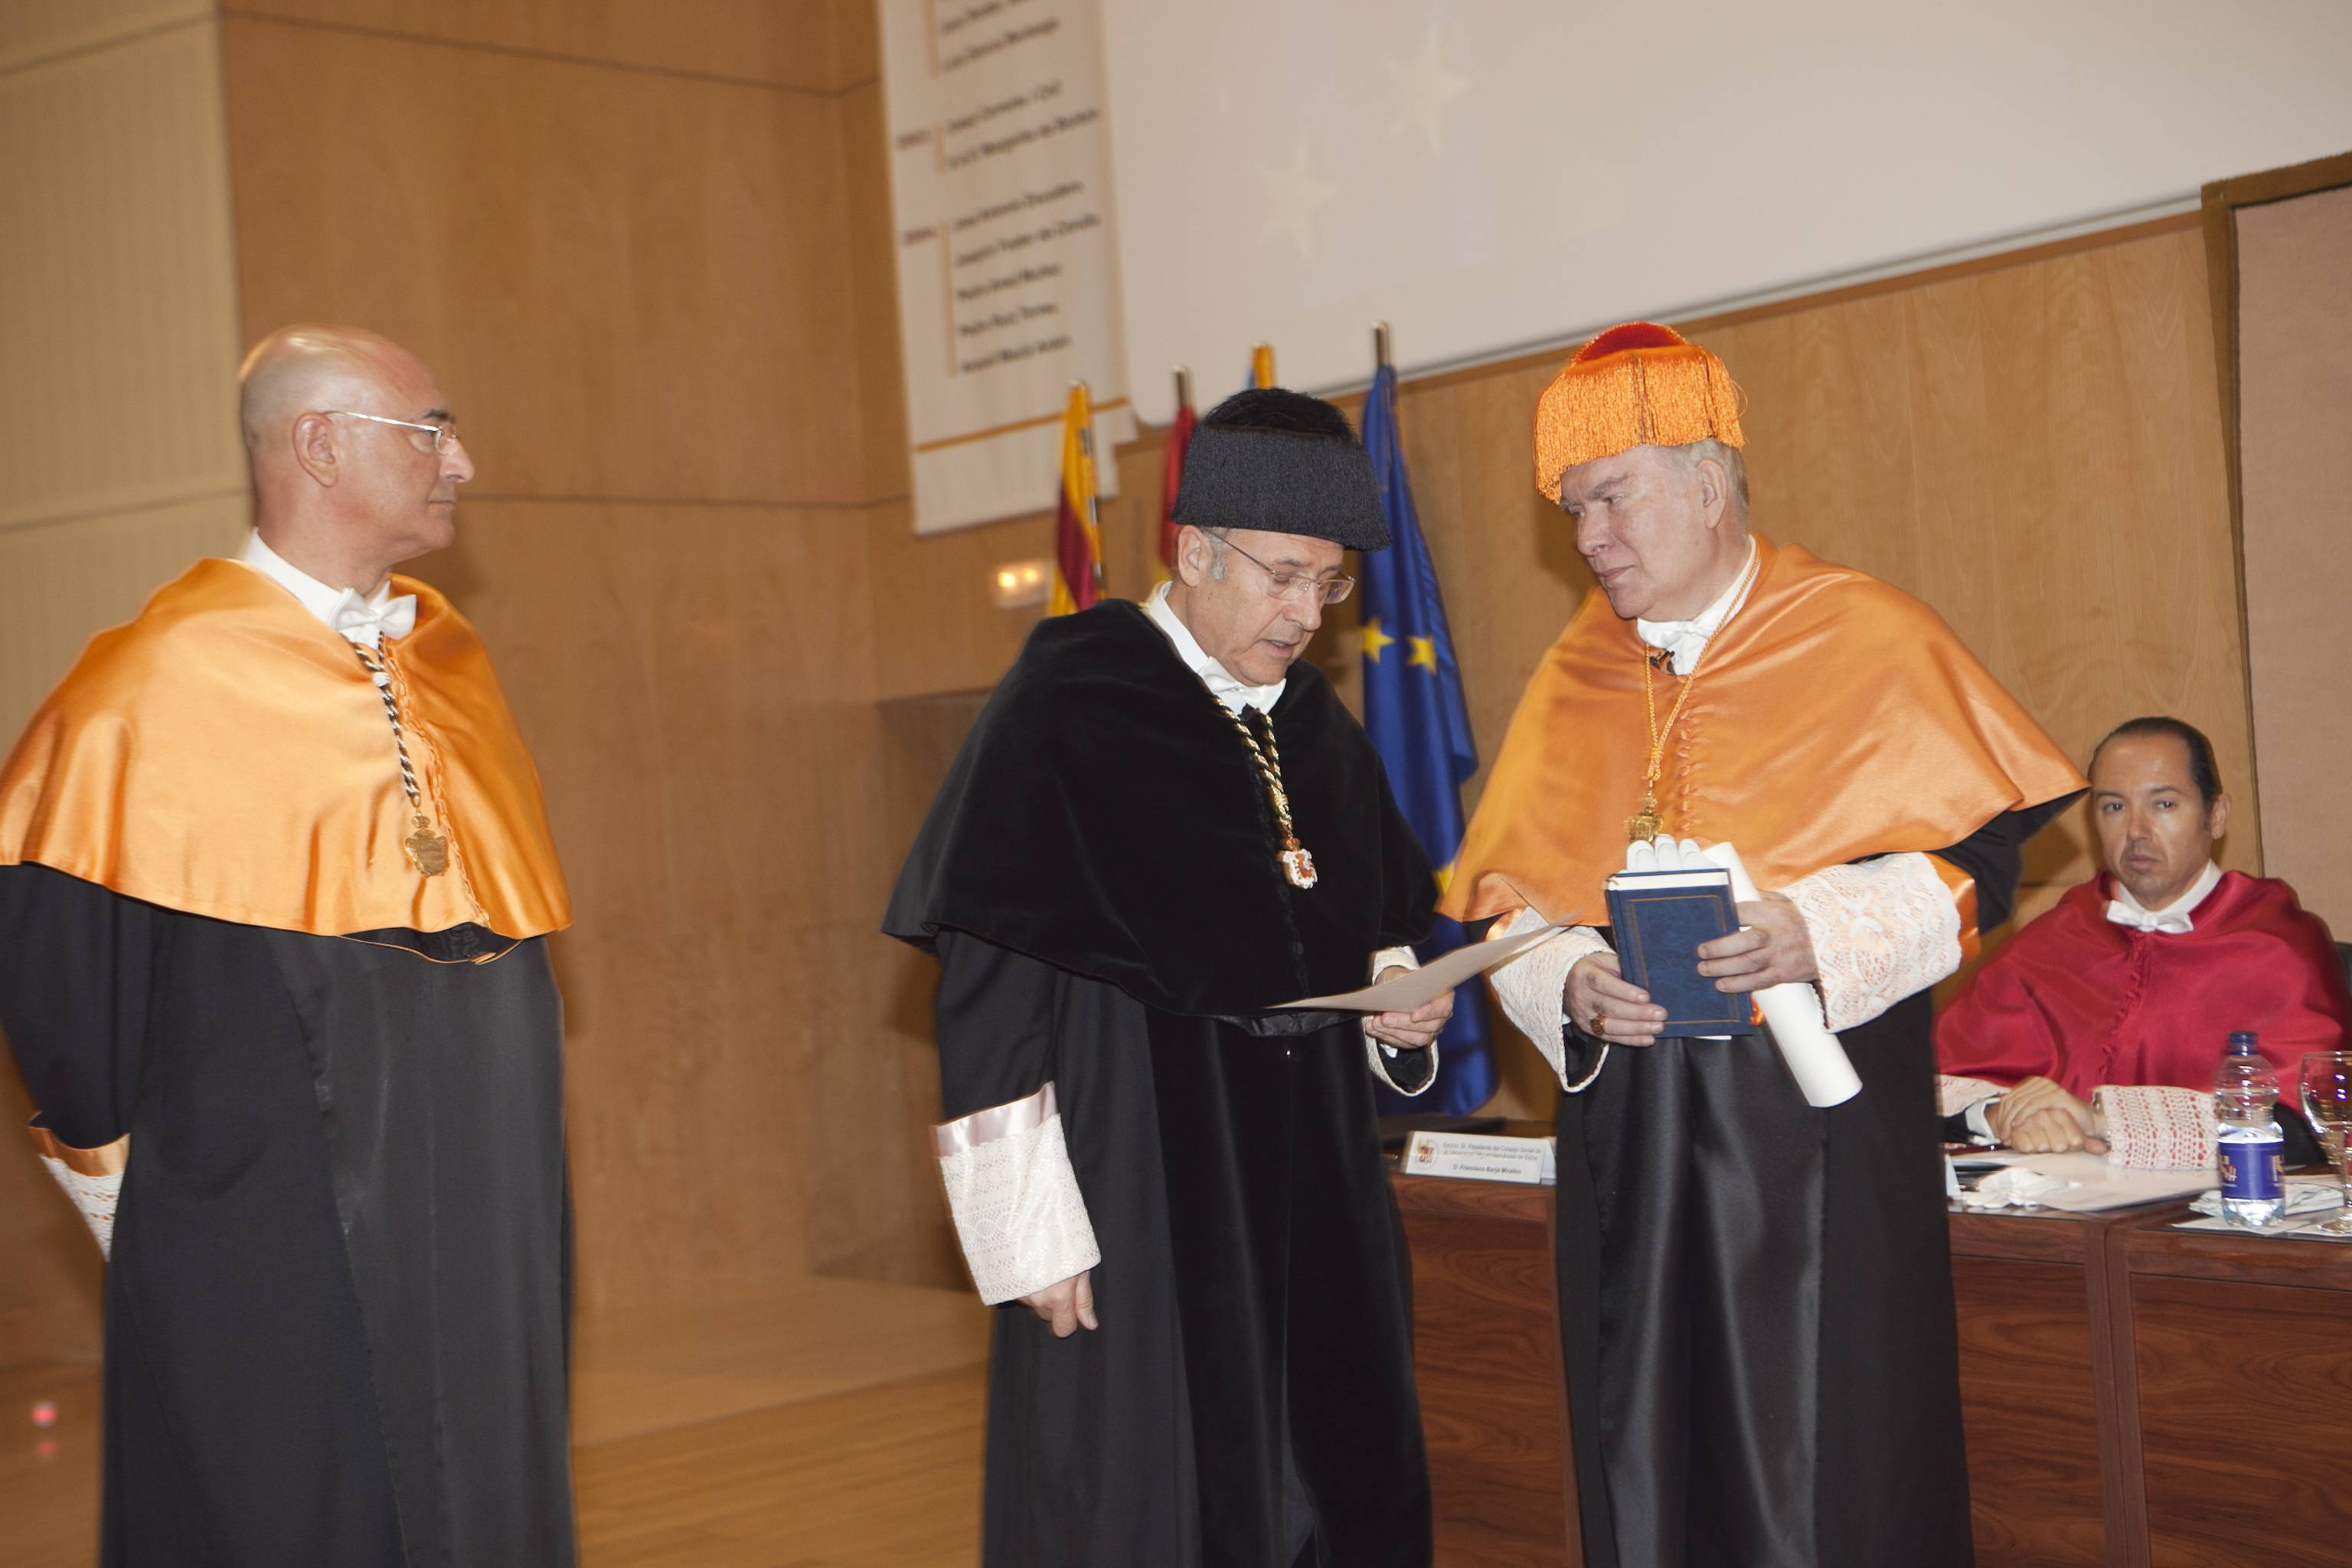 doctor-honoris-causa-luis-gamir_mg_0792.jpg